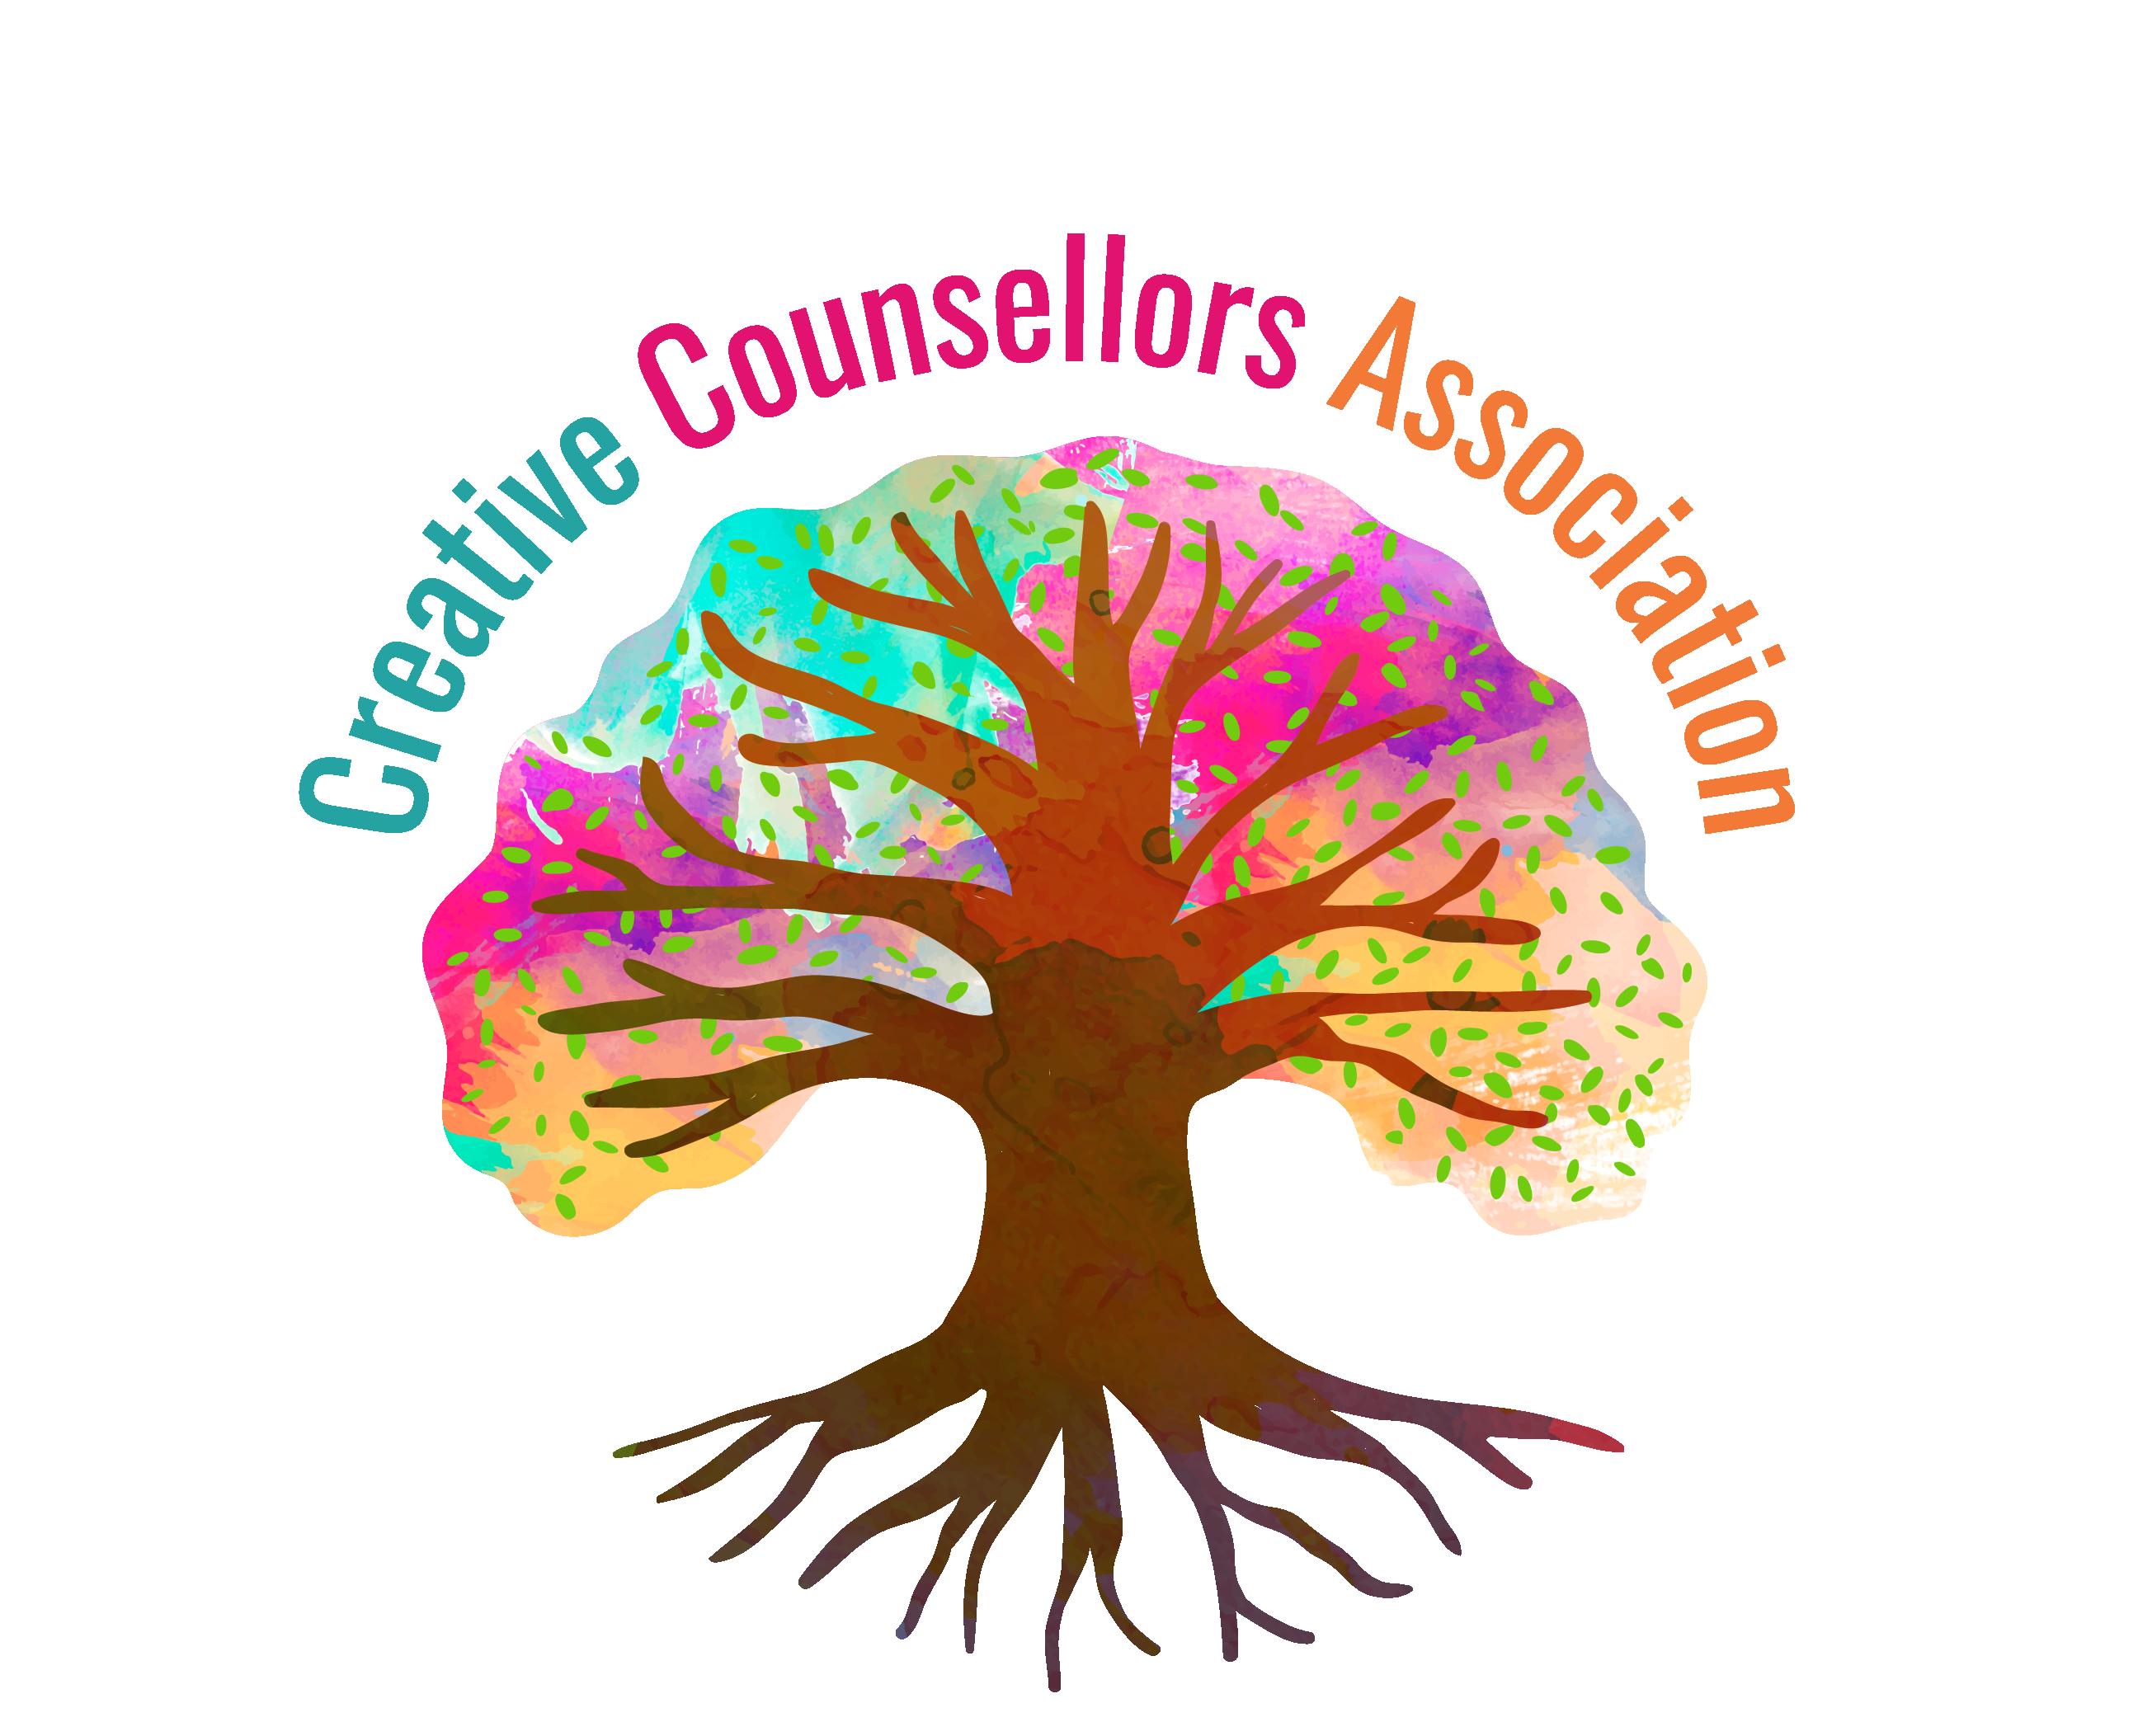 Creative Counsellors Association